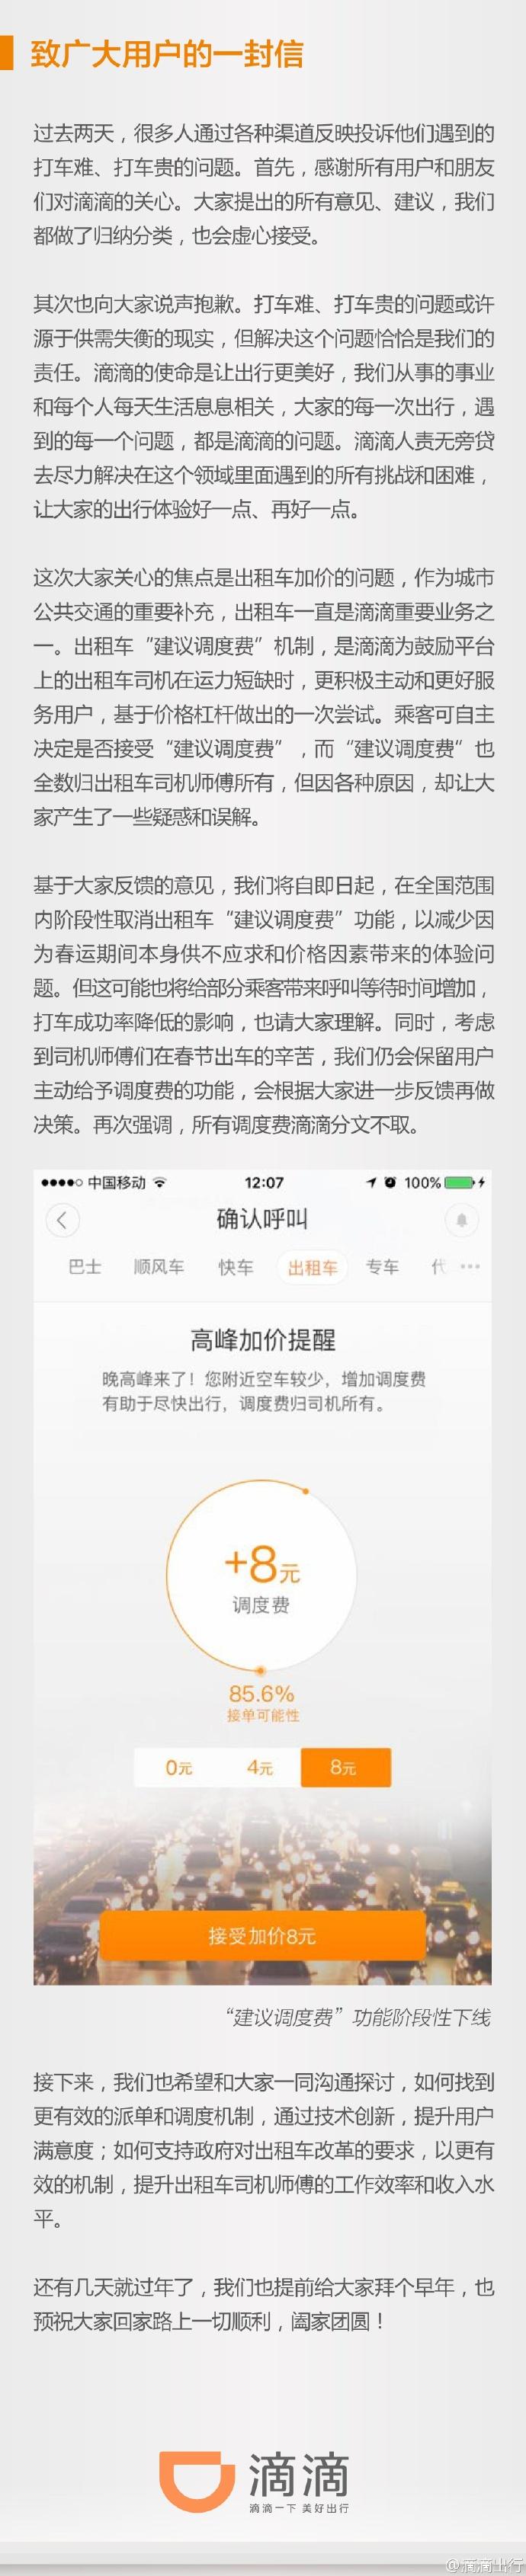 Kashbet送彩金娱乐网站